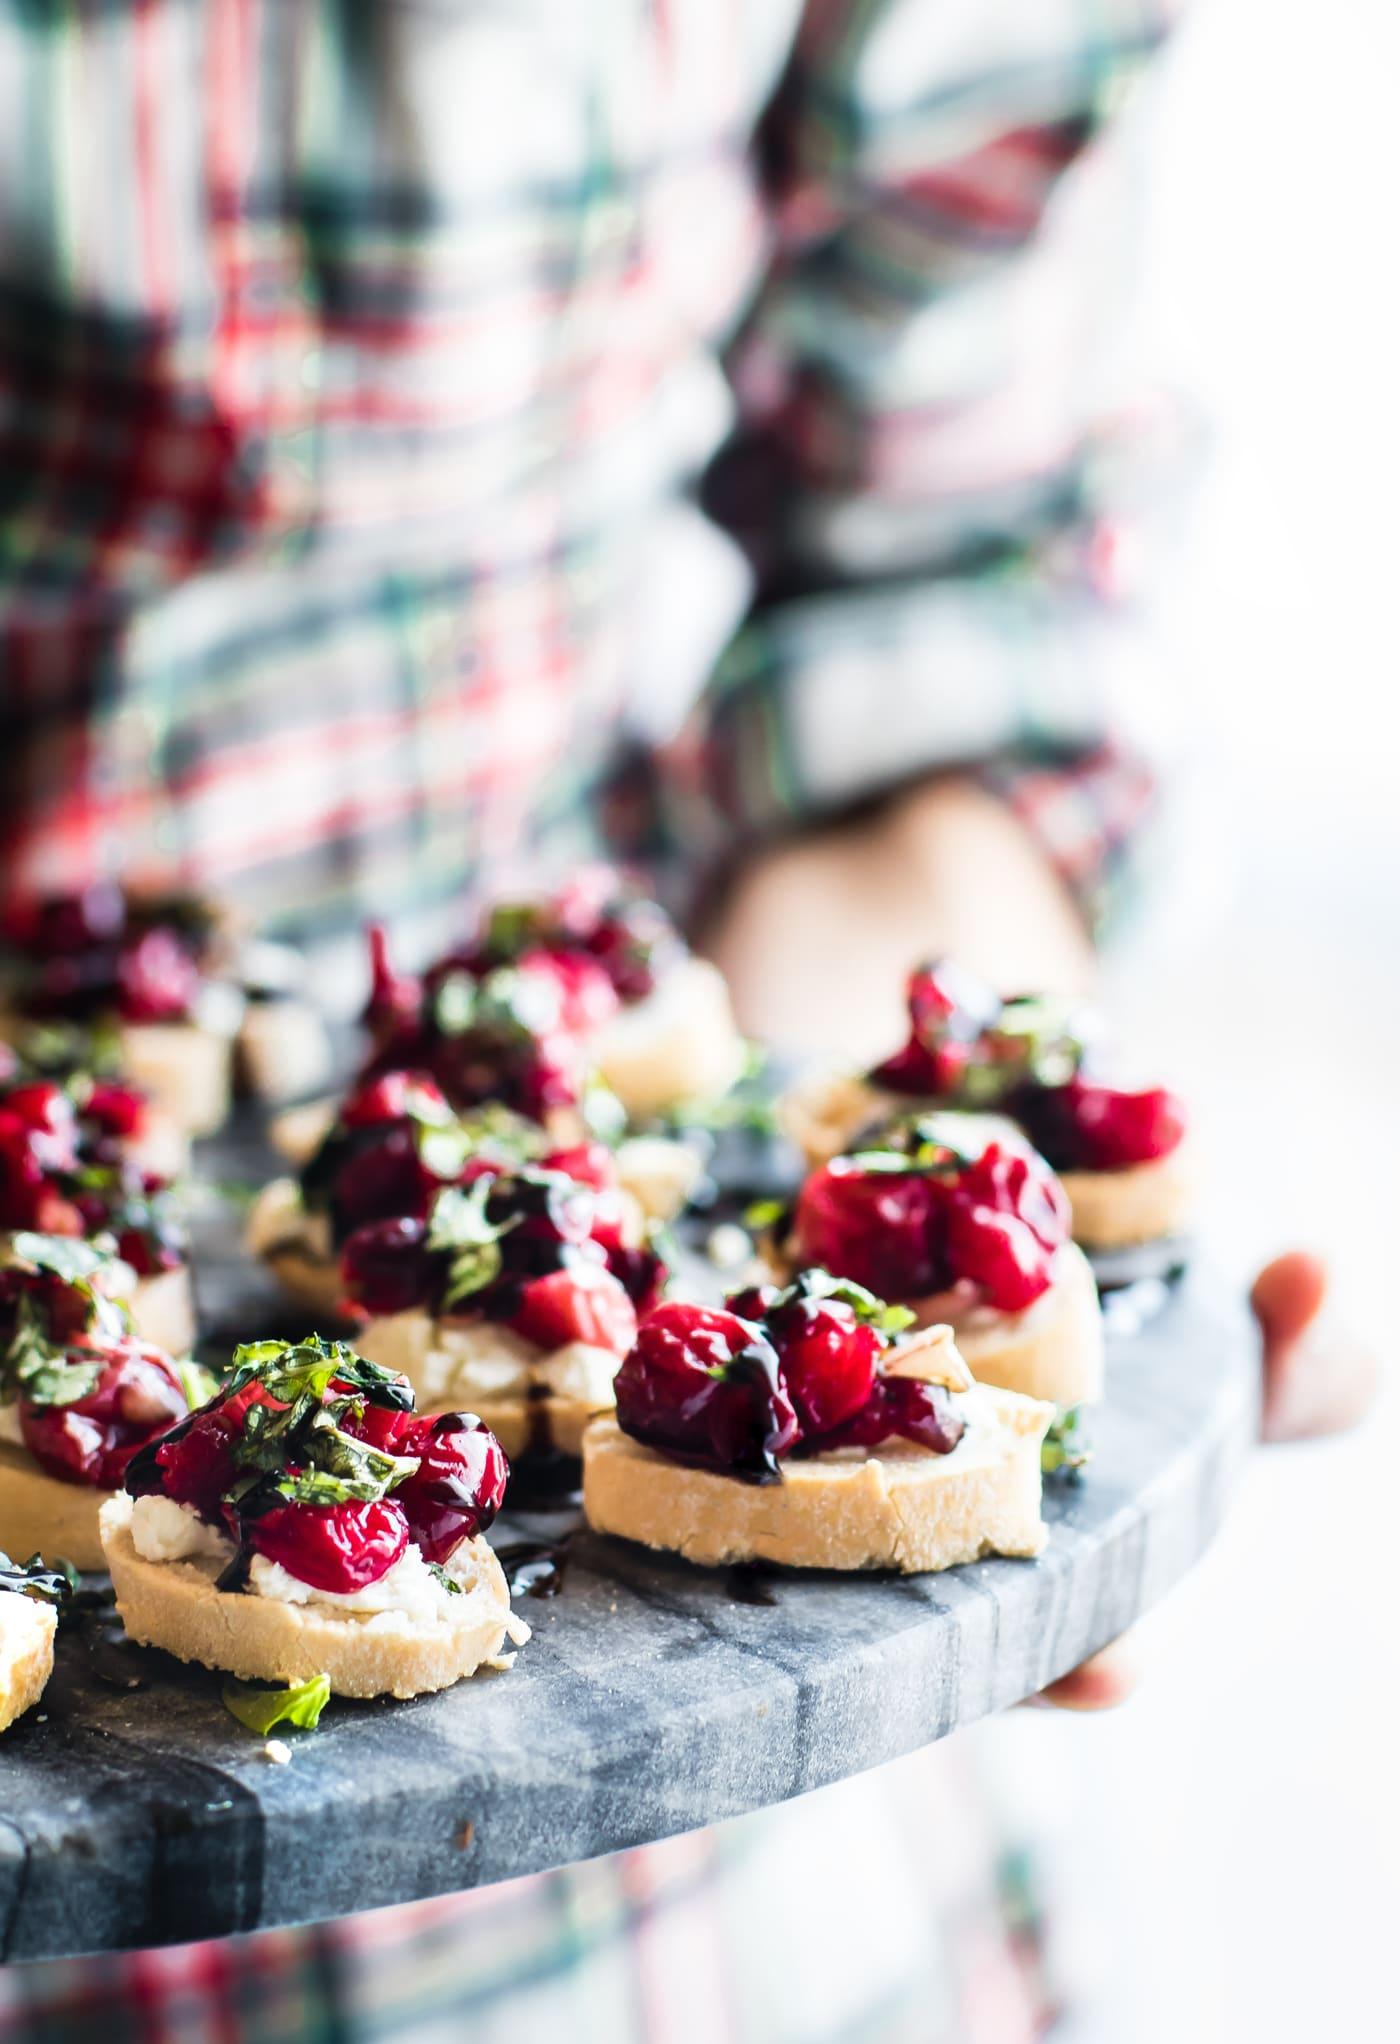 Cranberry Goat Cheese Crostini Recipe | gluten free | Cotter Crunch